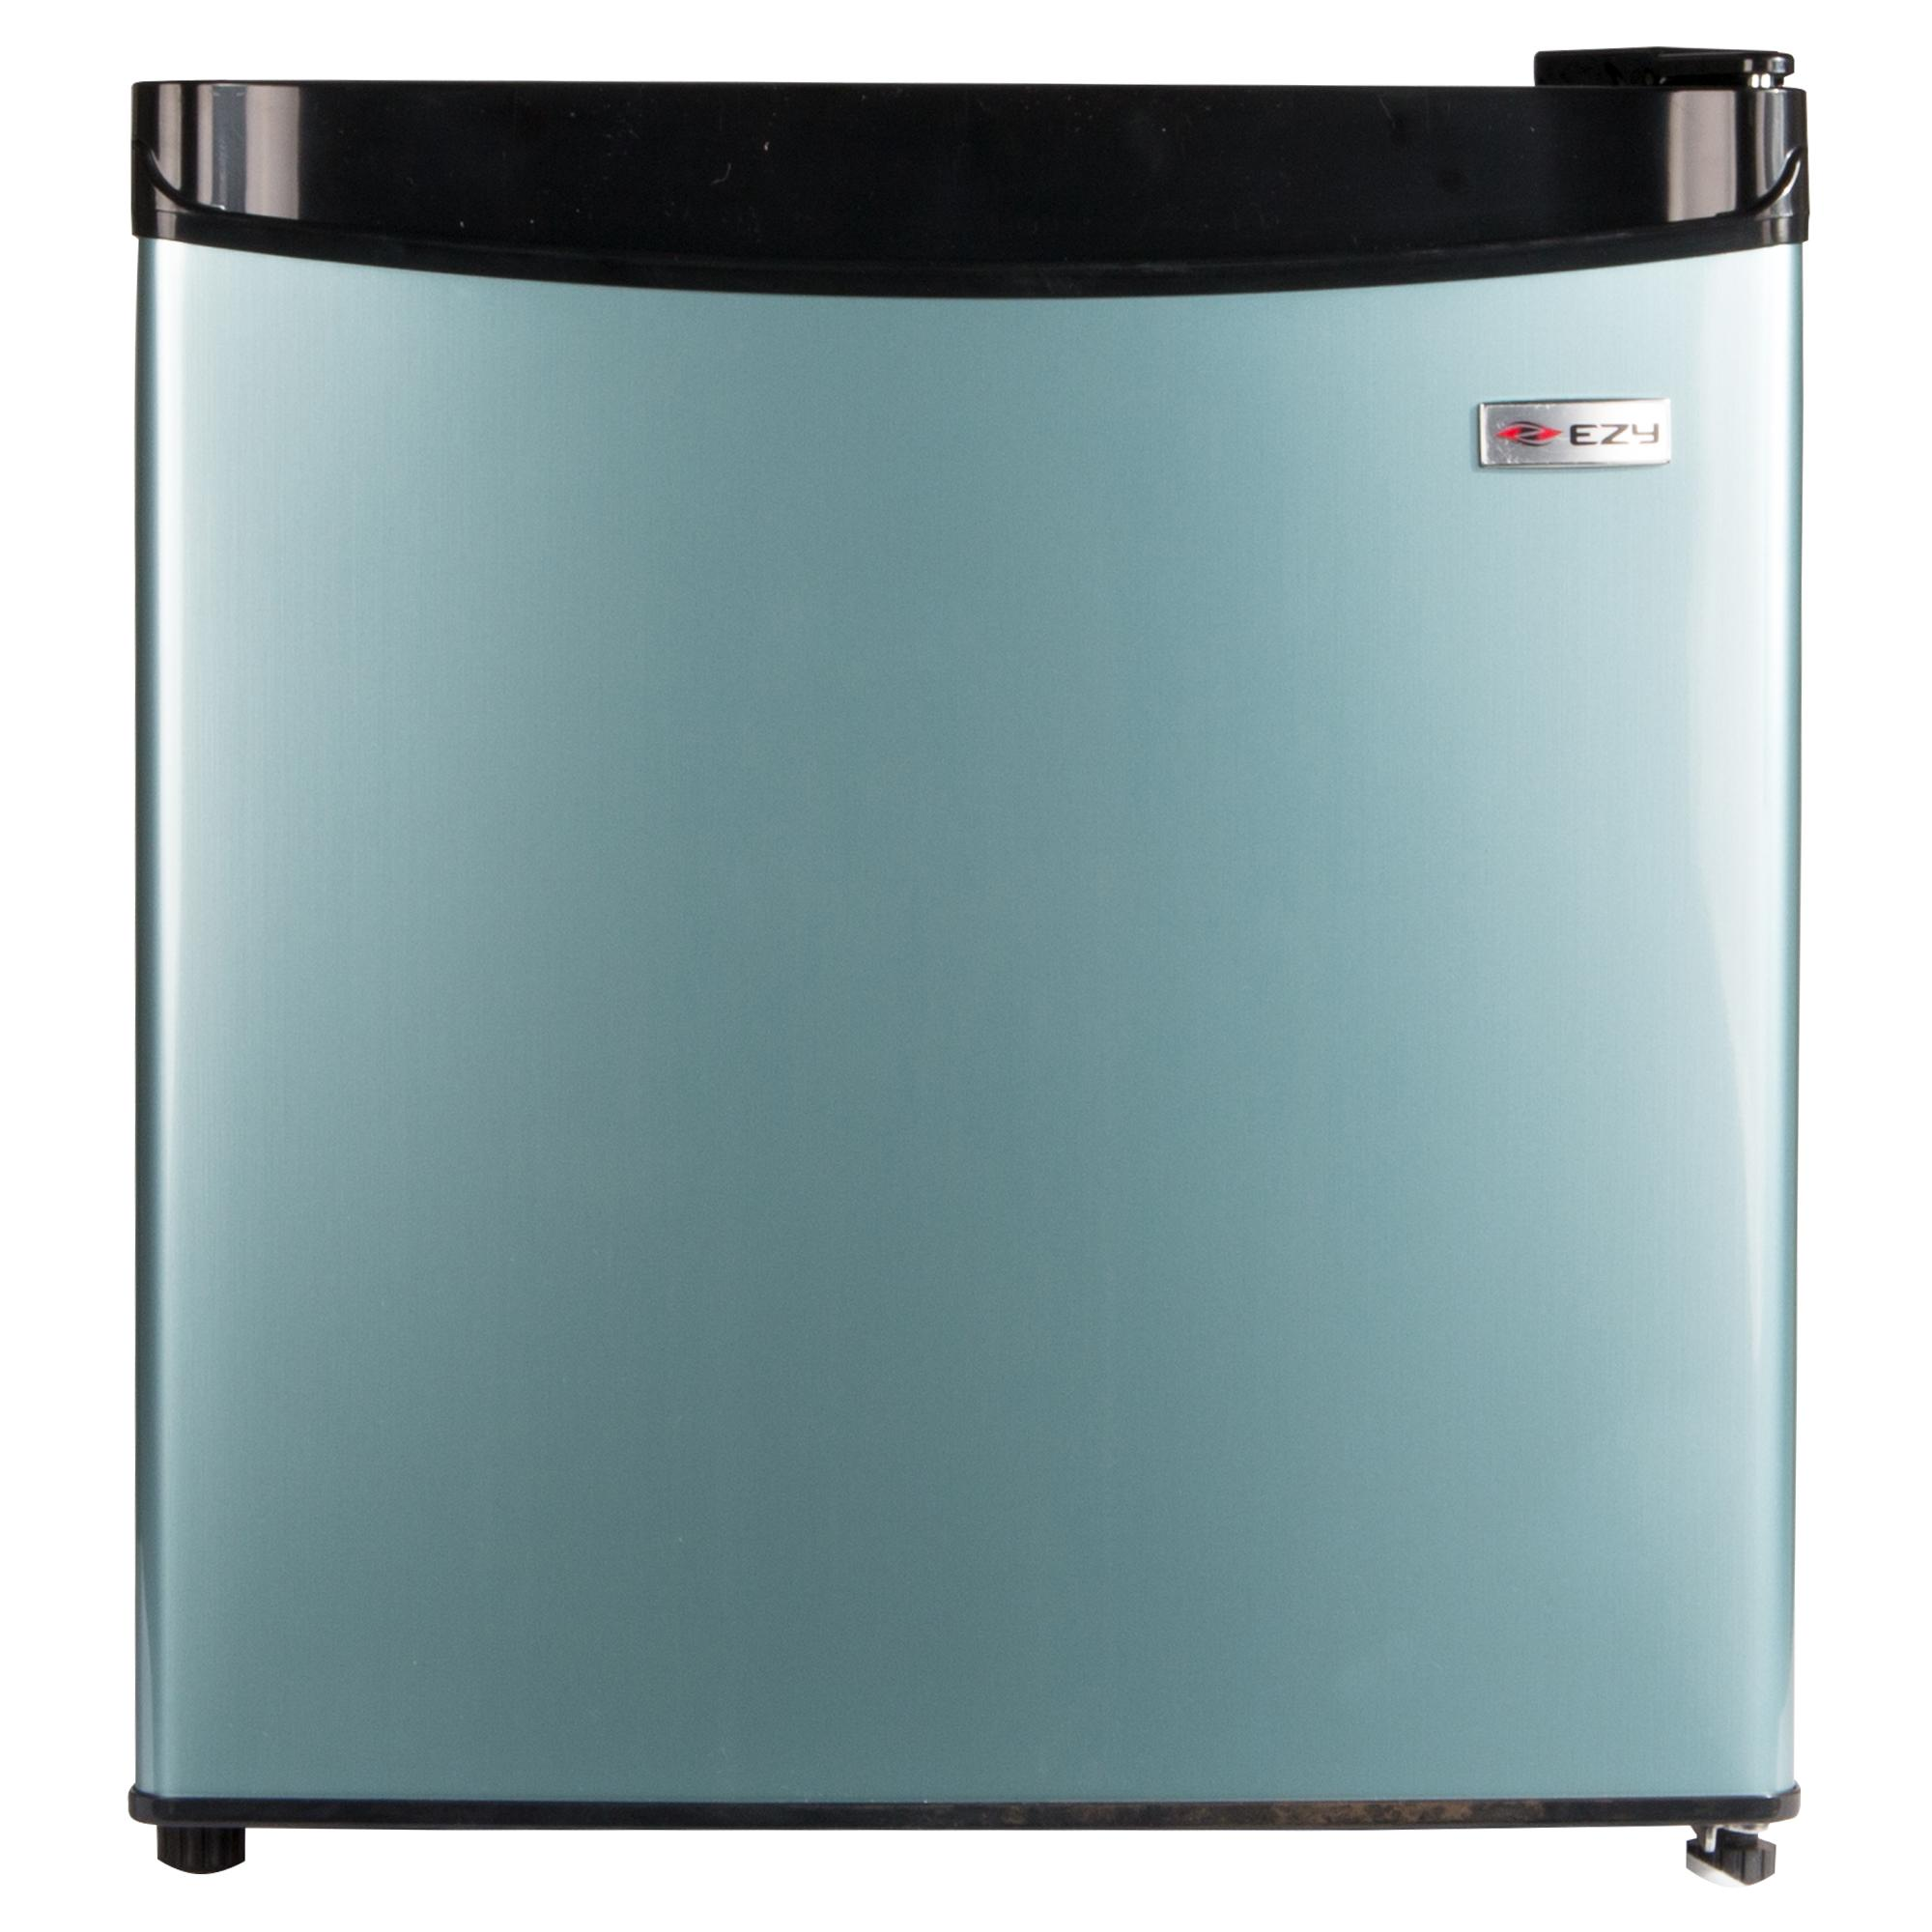 EZY ES-66F 1.7 Cu.ft. Refrigerator (Blue)